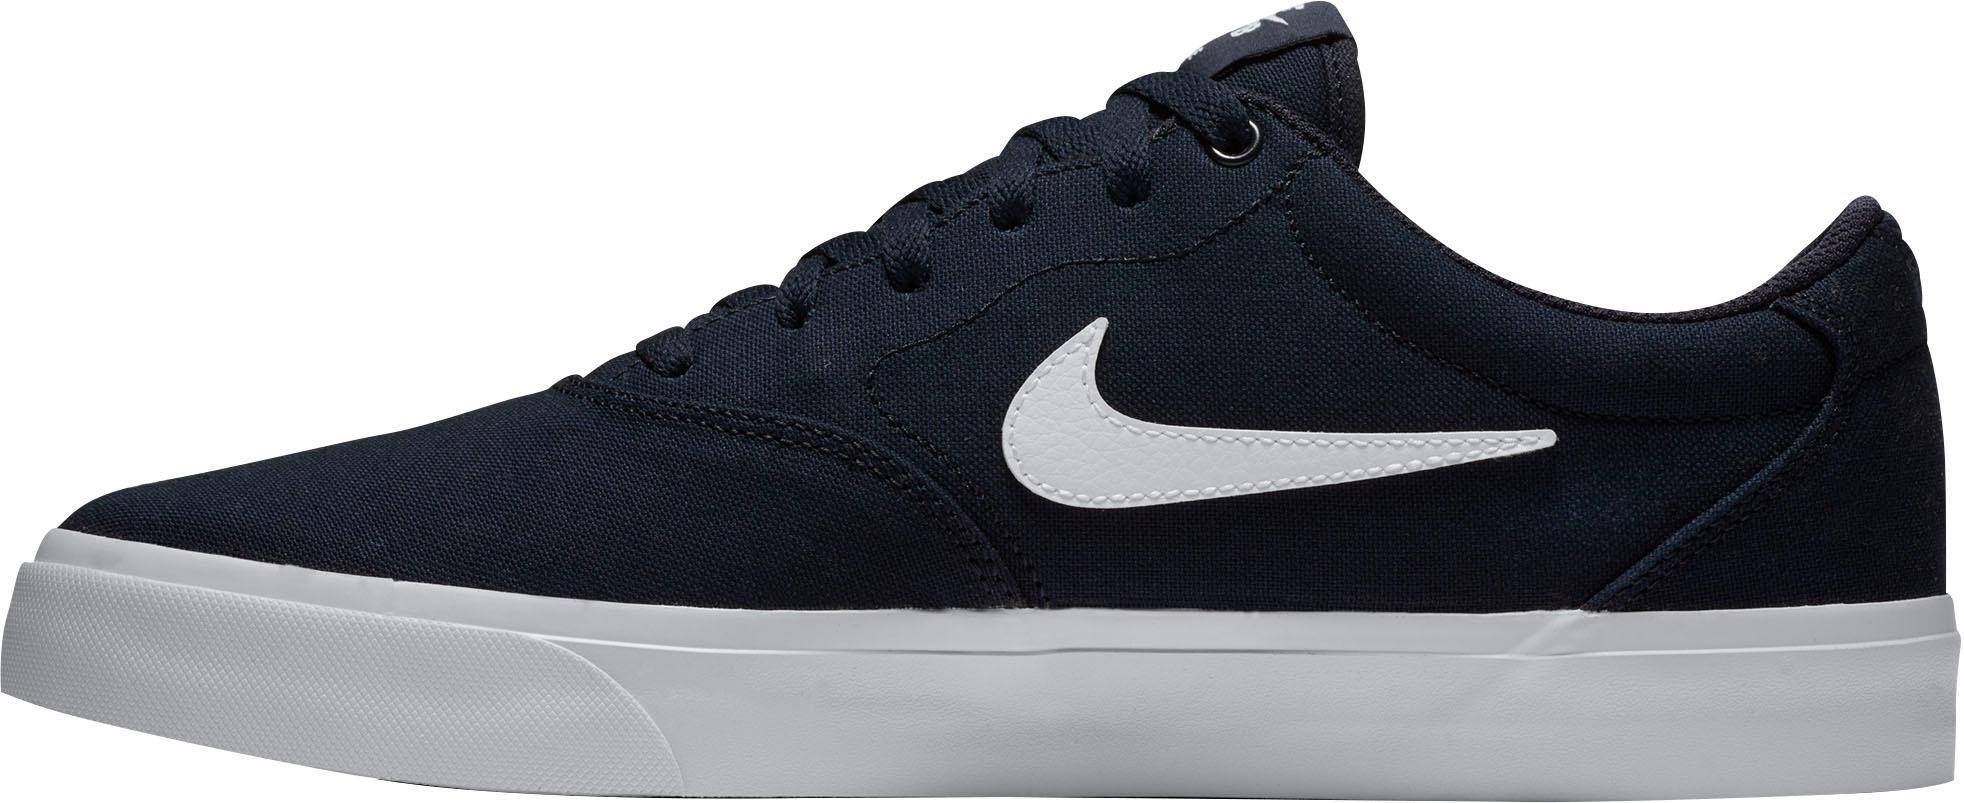 Nike SB sneakers »Charge Solarsoft Textile Skate« bij OTTO online kopen